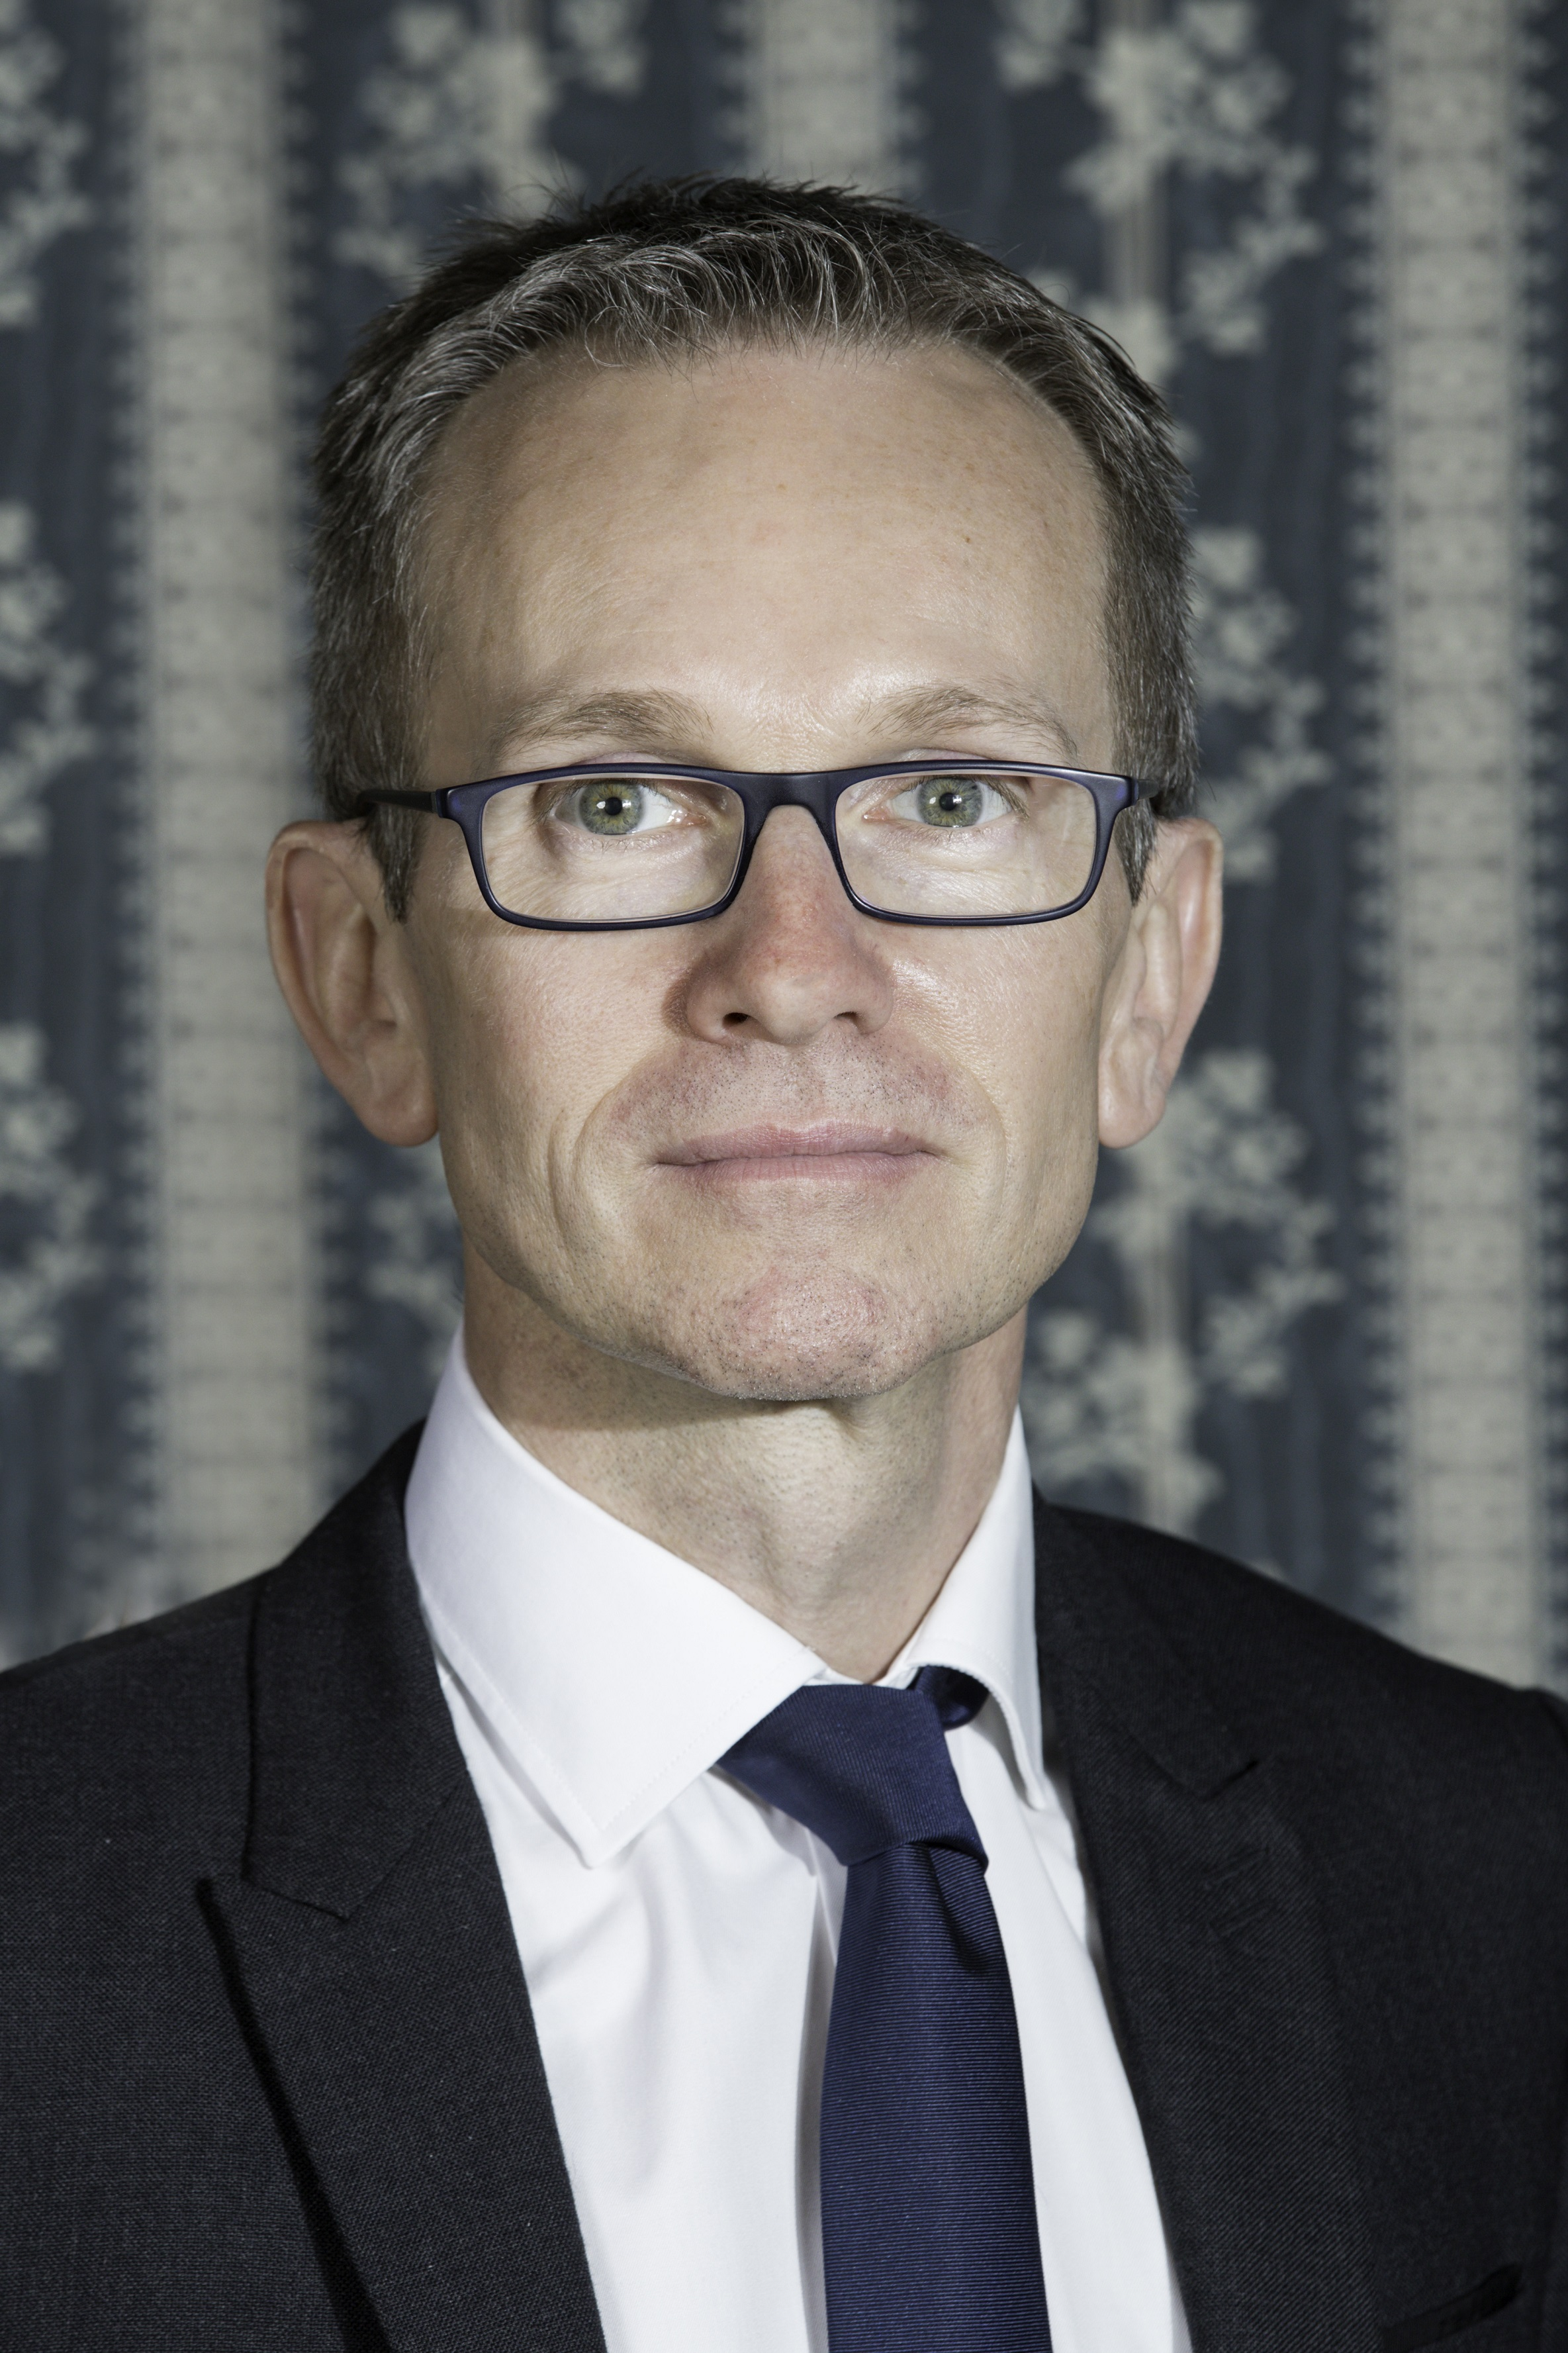 Jean-François Mayet